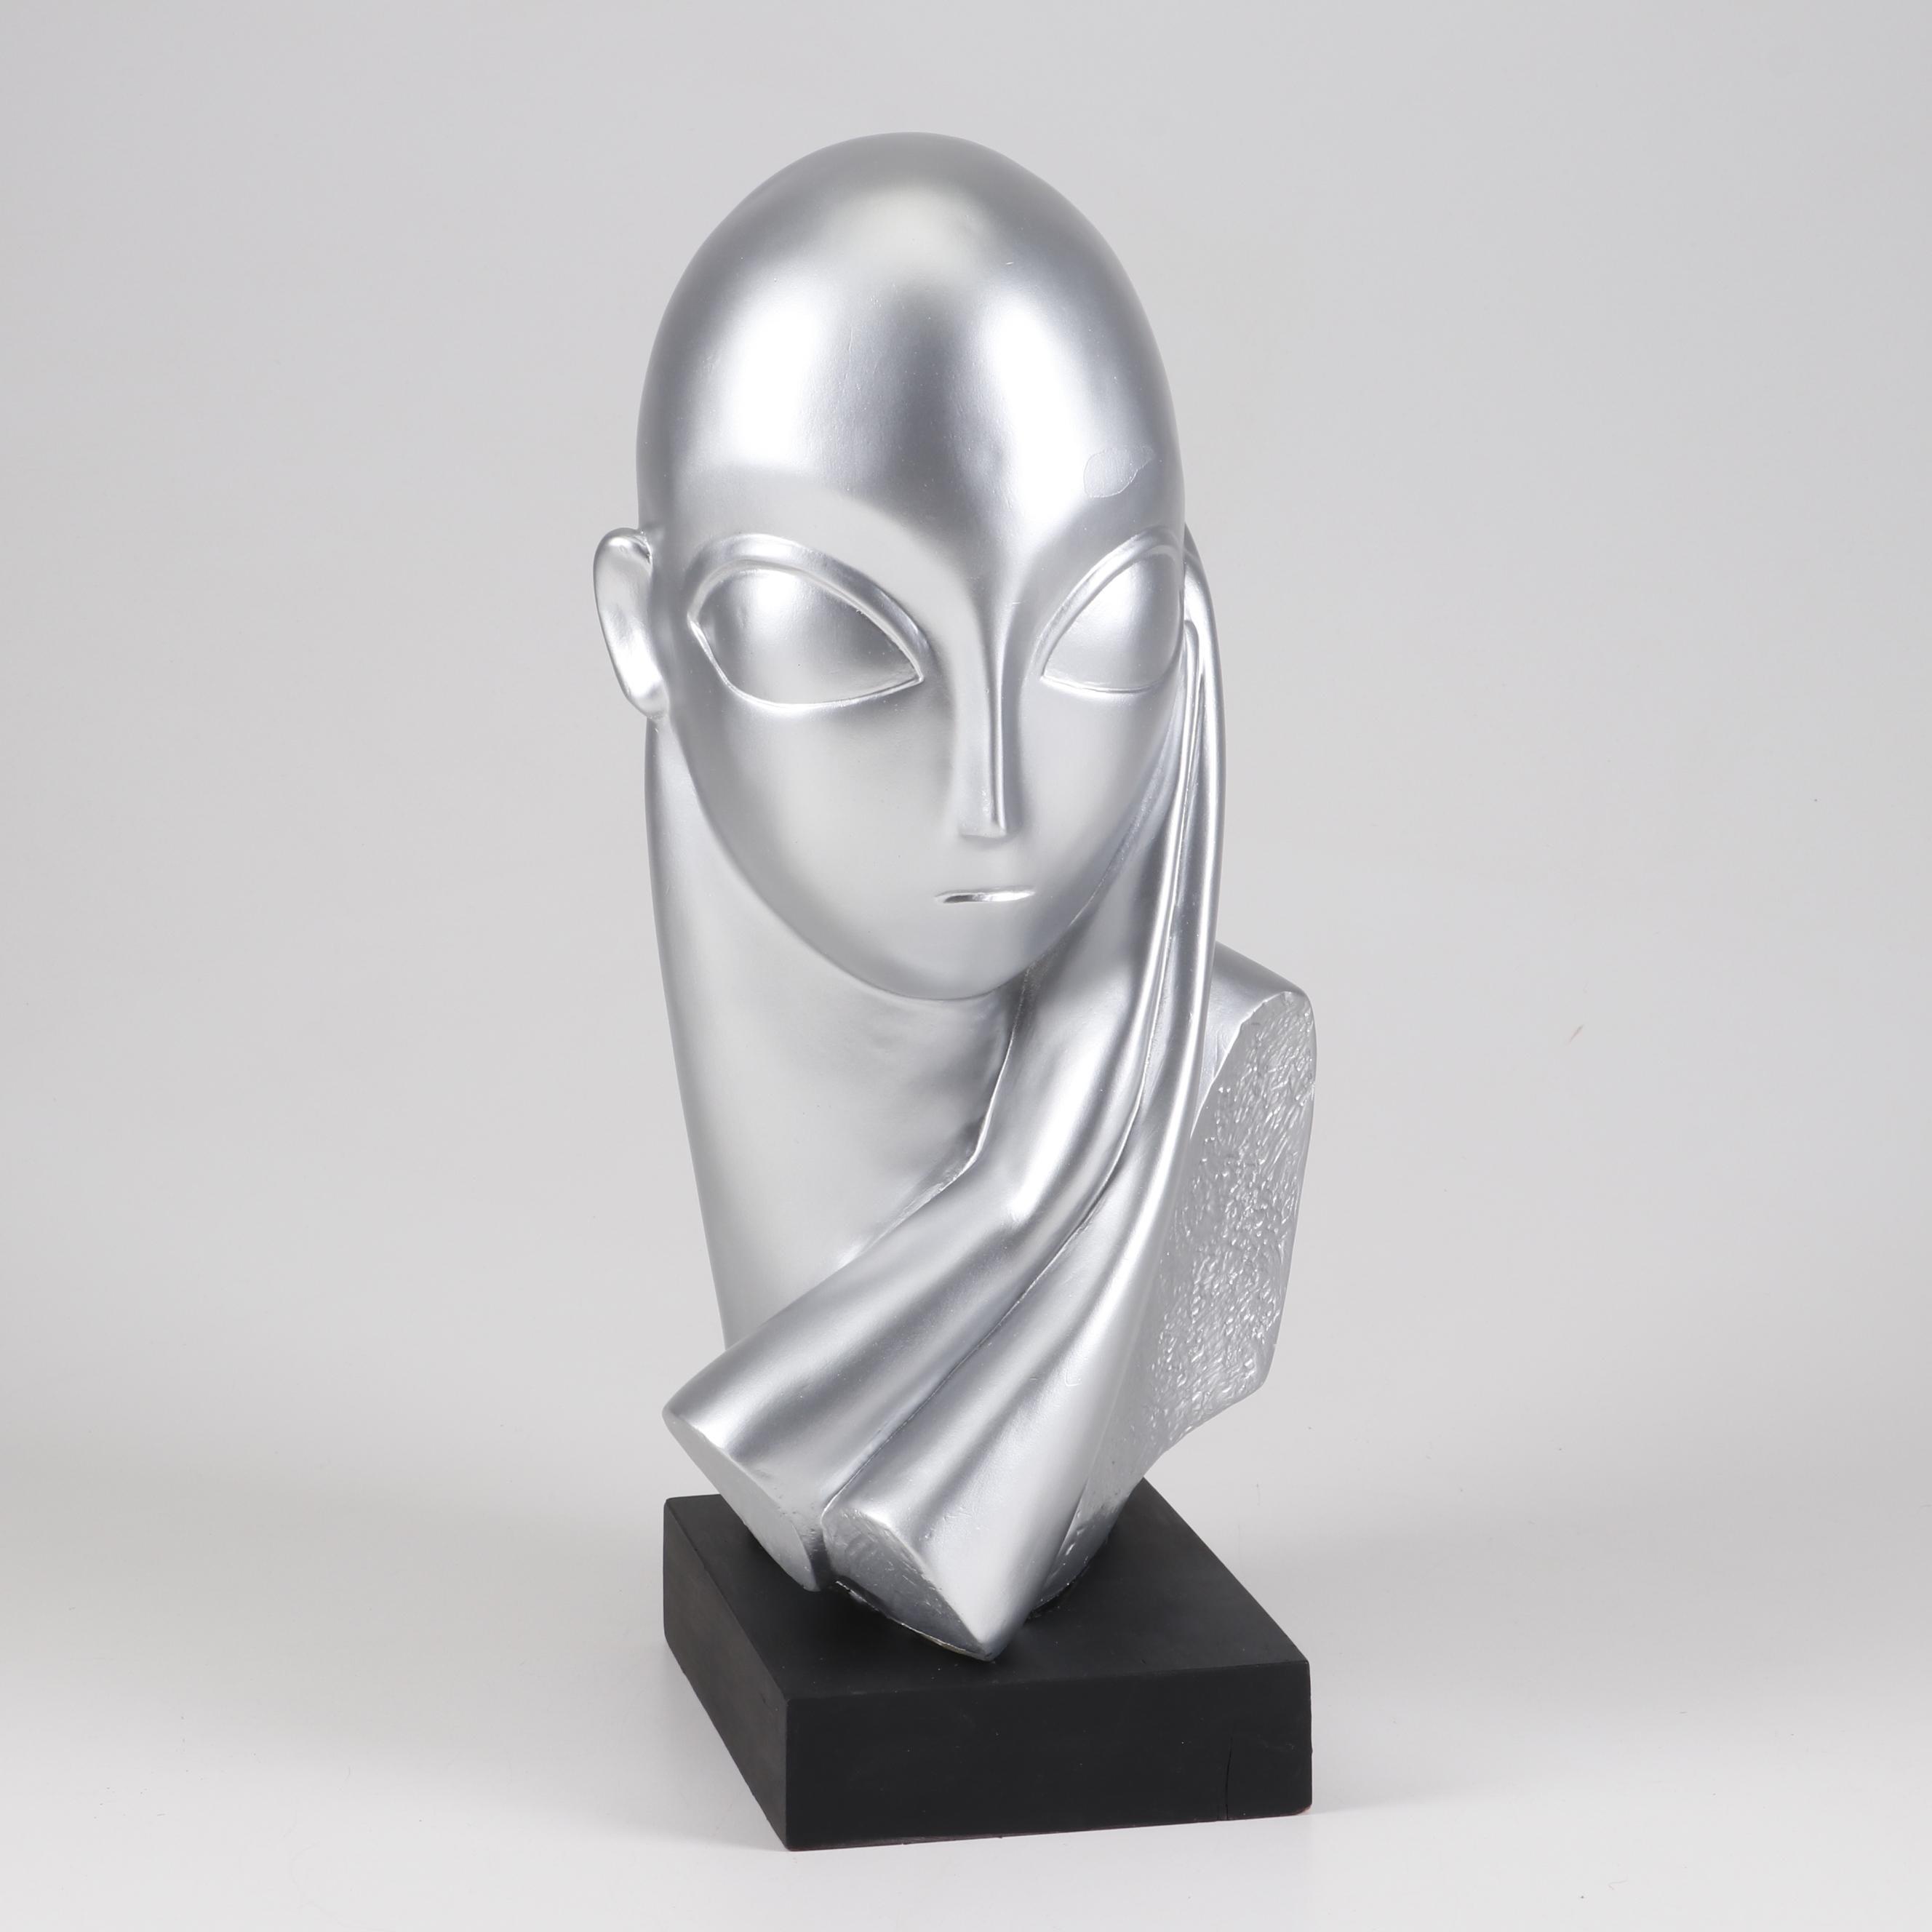 Austin Productions Ceramic Sculpture after Constantin Brancusi